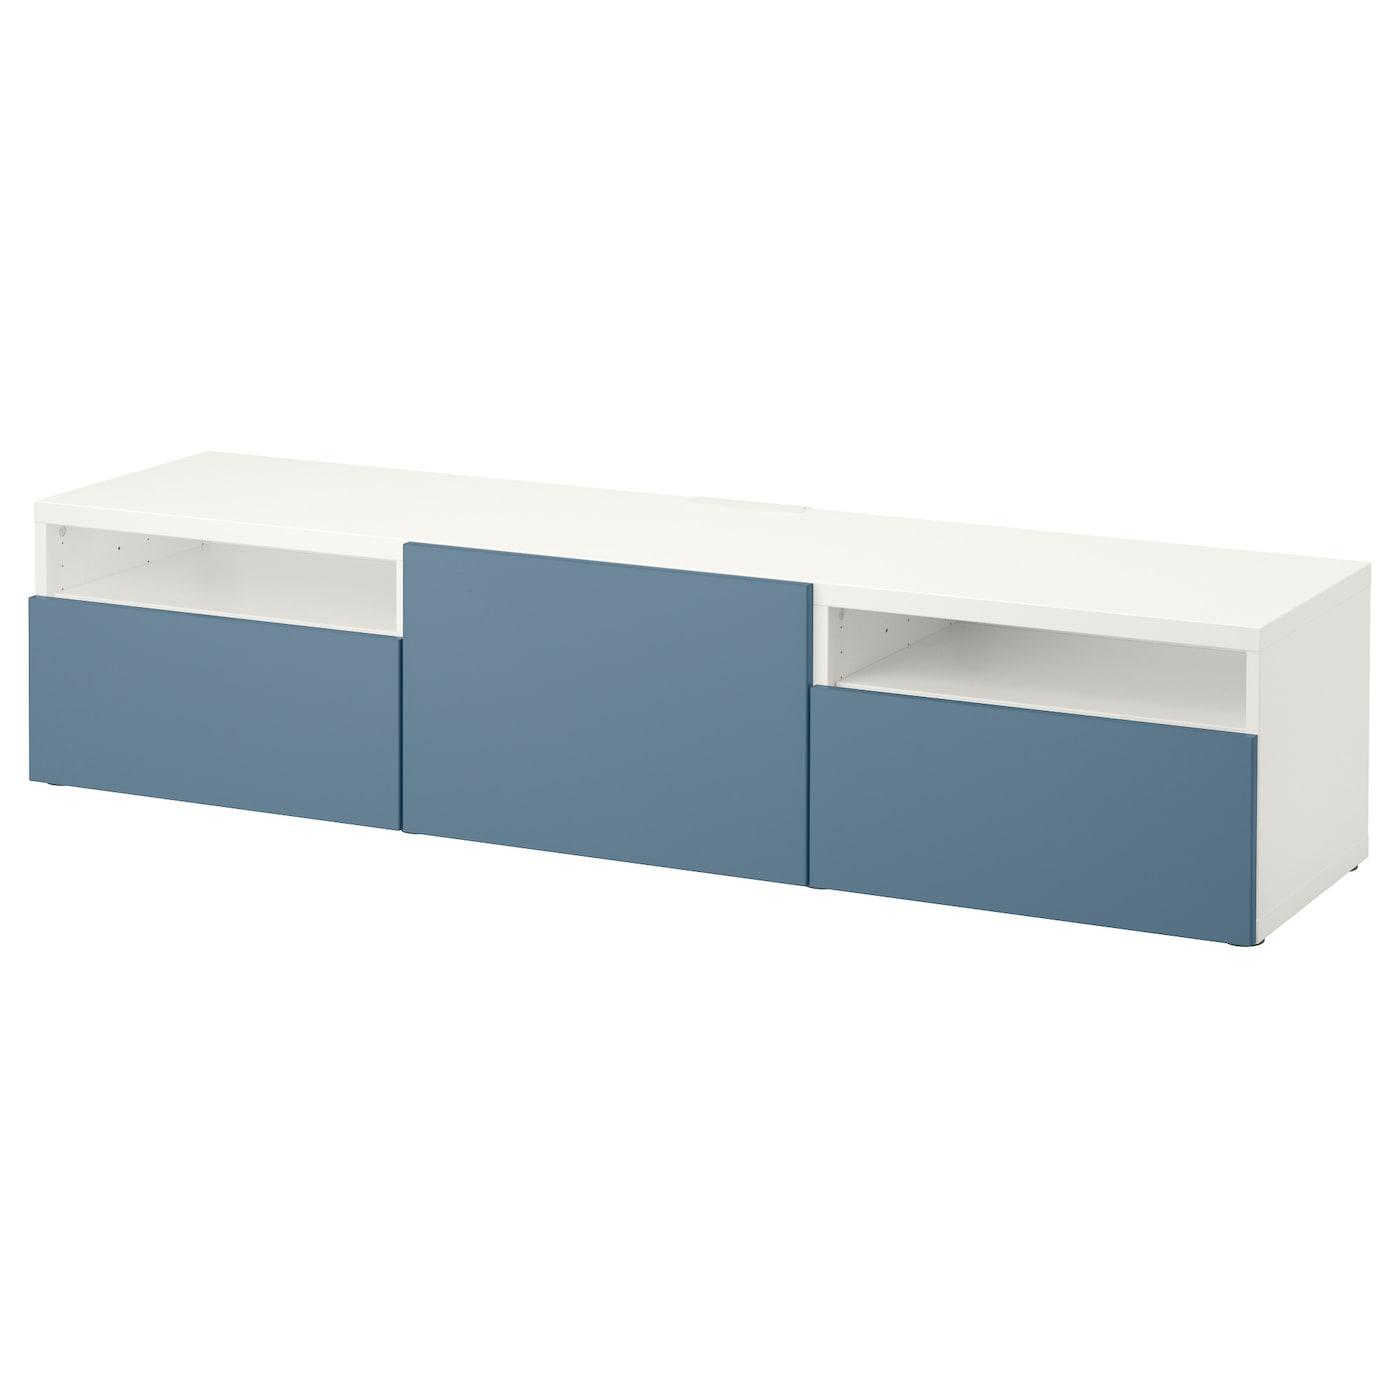 best tv bench with drawers white valviken dark blue 180x40x38 cm ikea. Black Bedroom Furniture Sets. Home Design Ideas